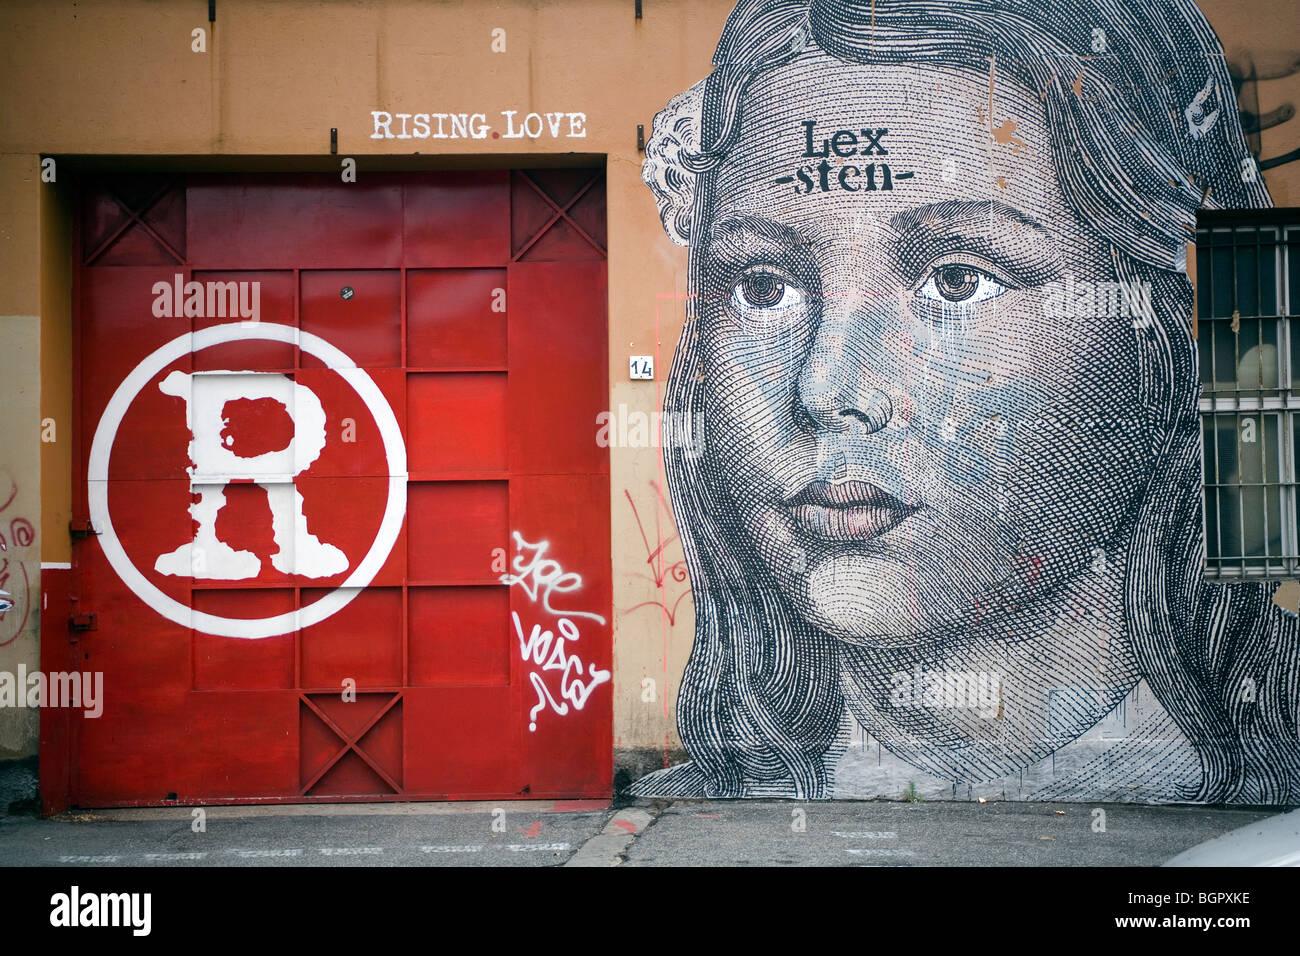 Amor creciente graffiti dibujar en una pared, Roma, Italia Imagen De Stock